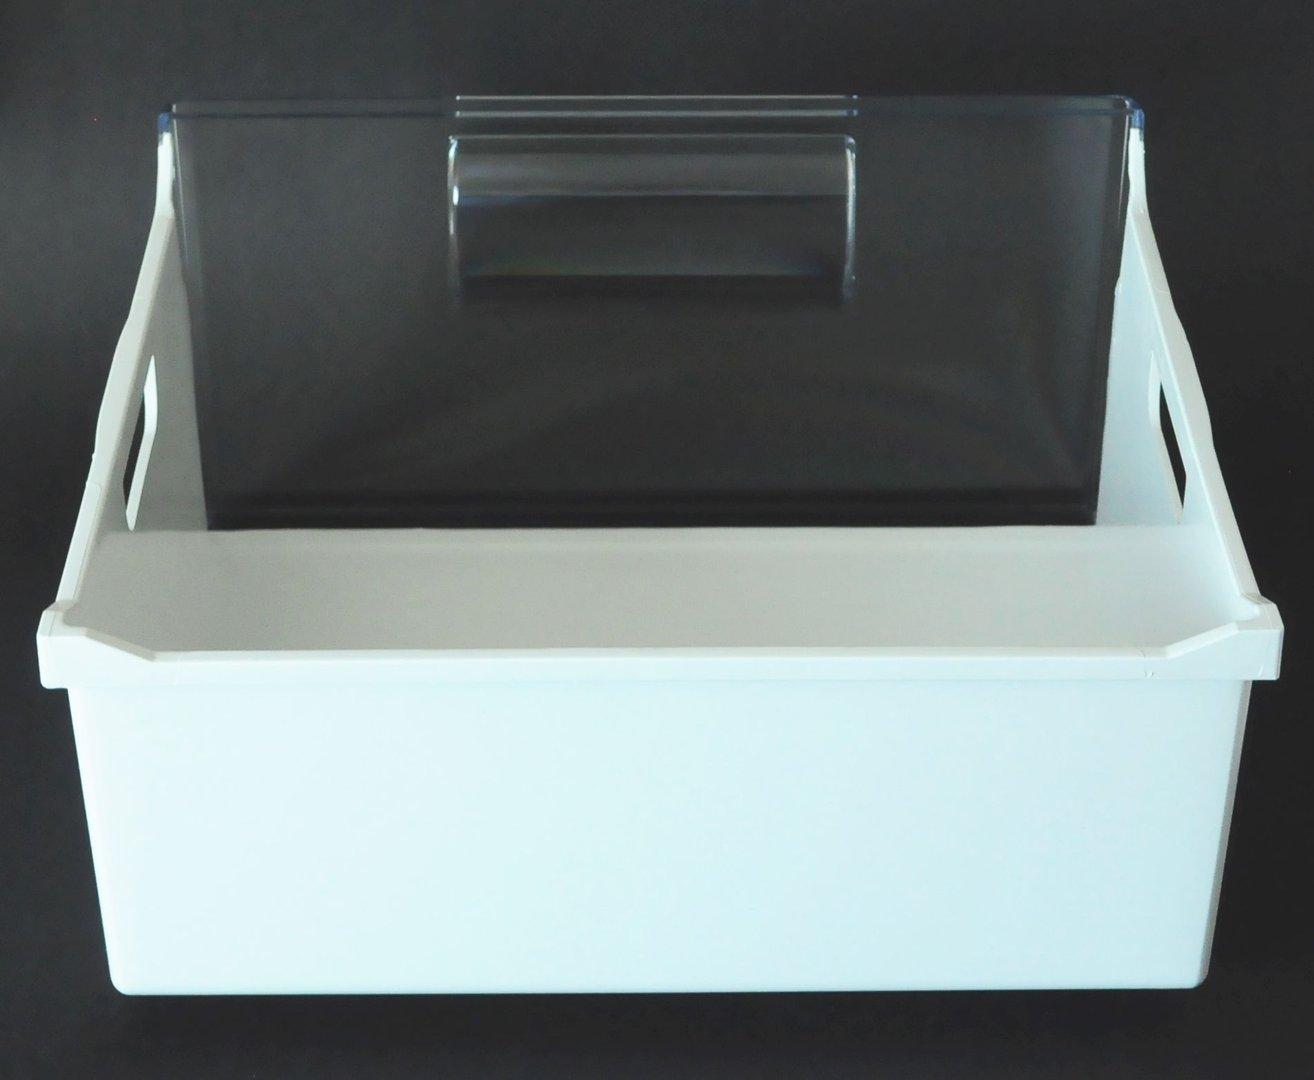 privileg zanker schublade k hl kombi gefrierschrank 2003790272. Black Bedroom Furniture Sets. Home Design Ideas